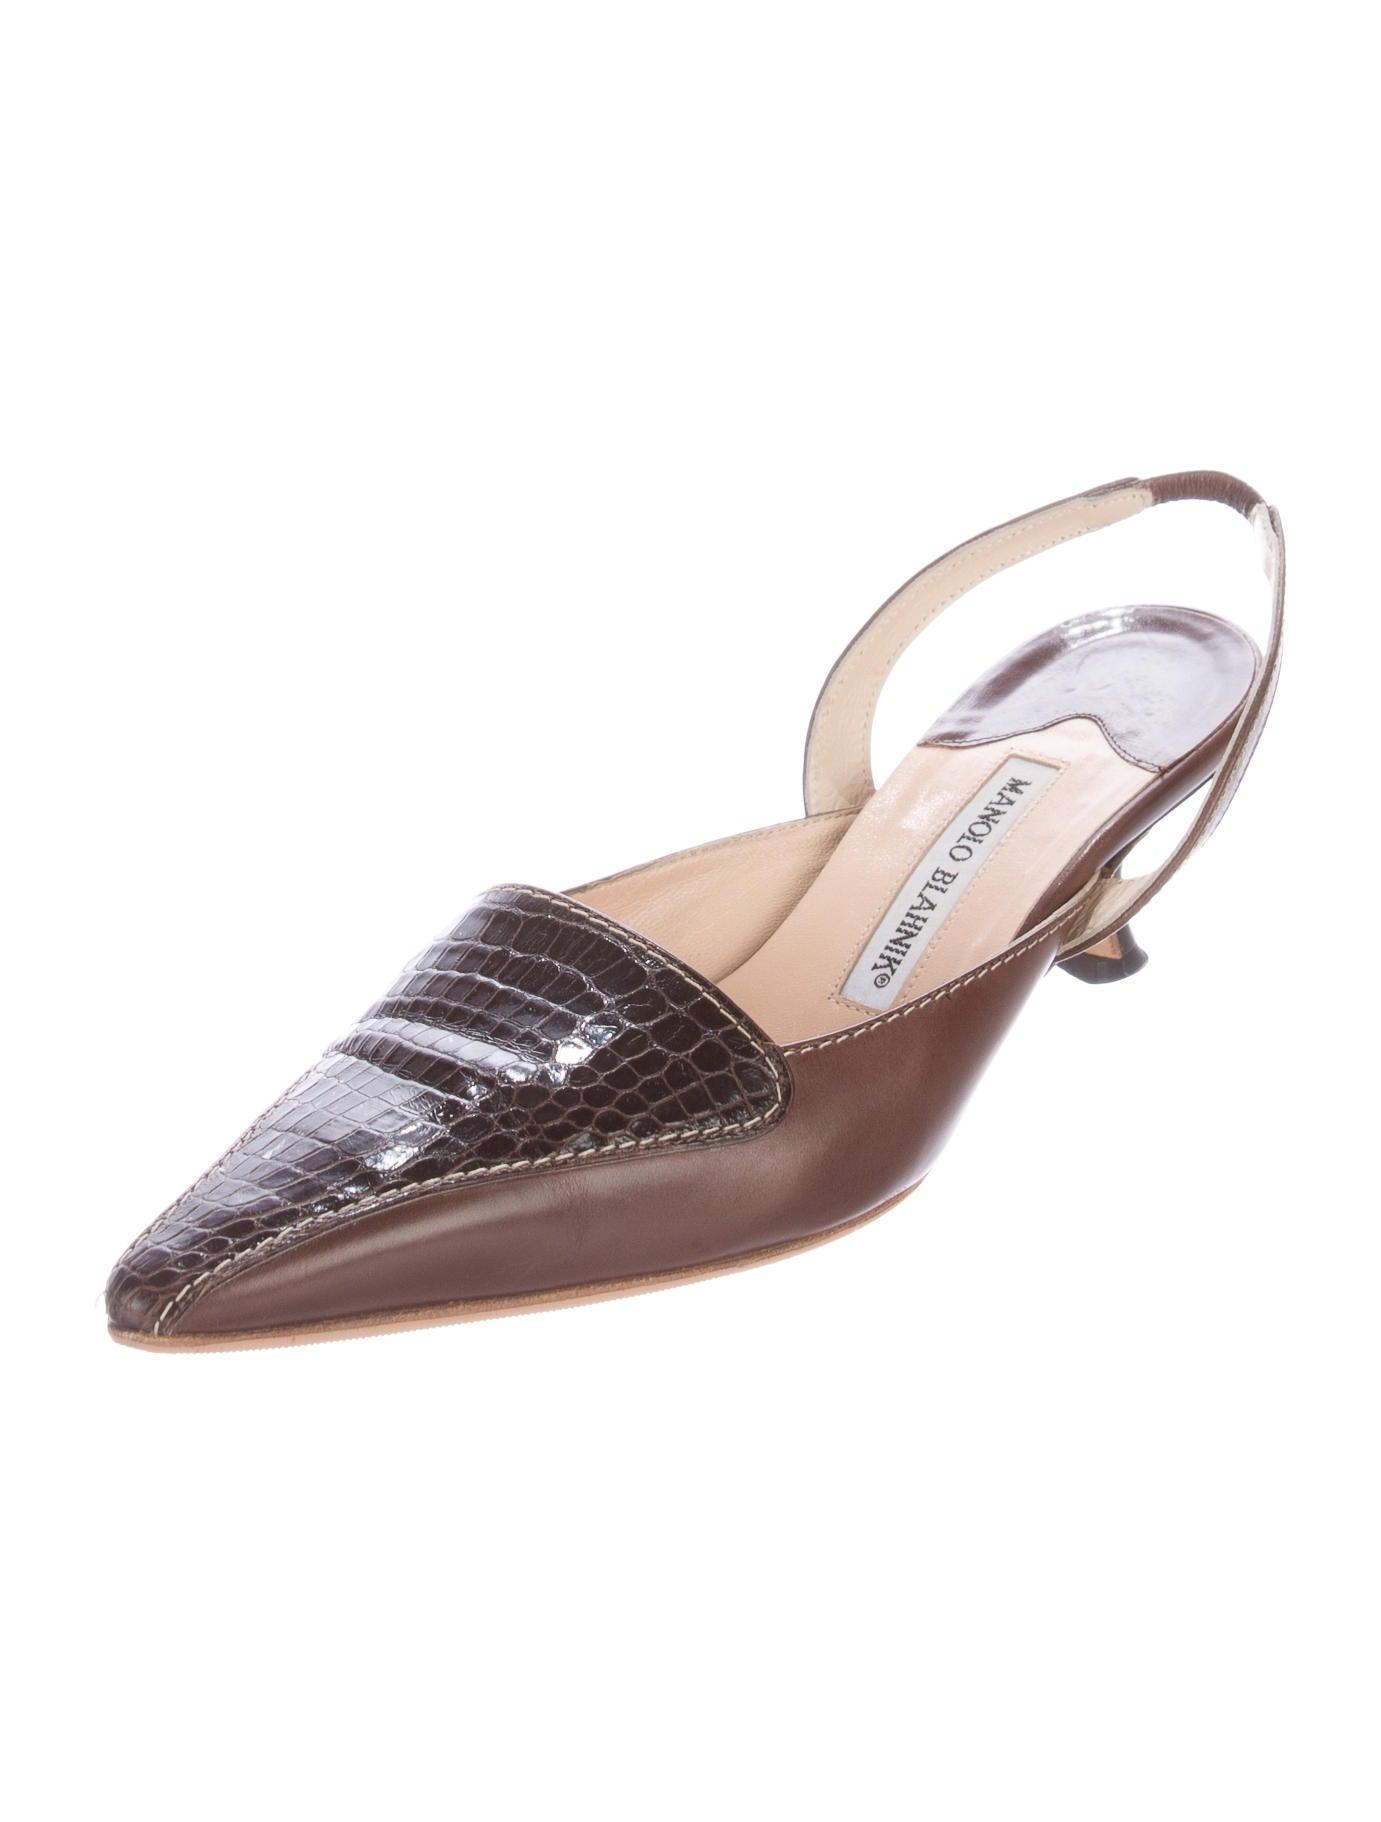 Light Brown Alligator Shoes For Women